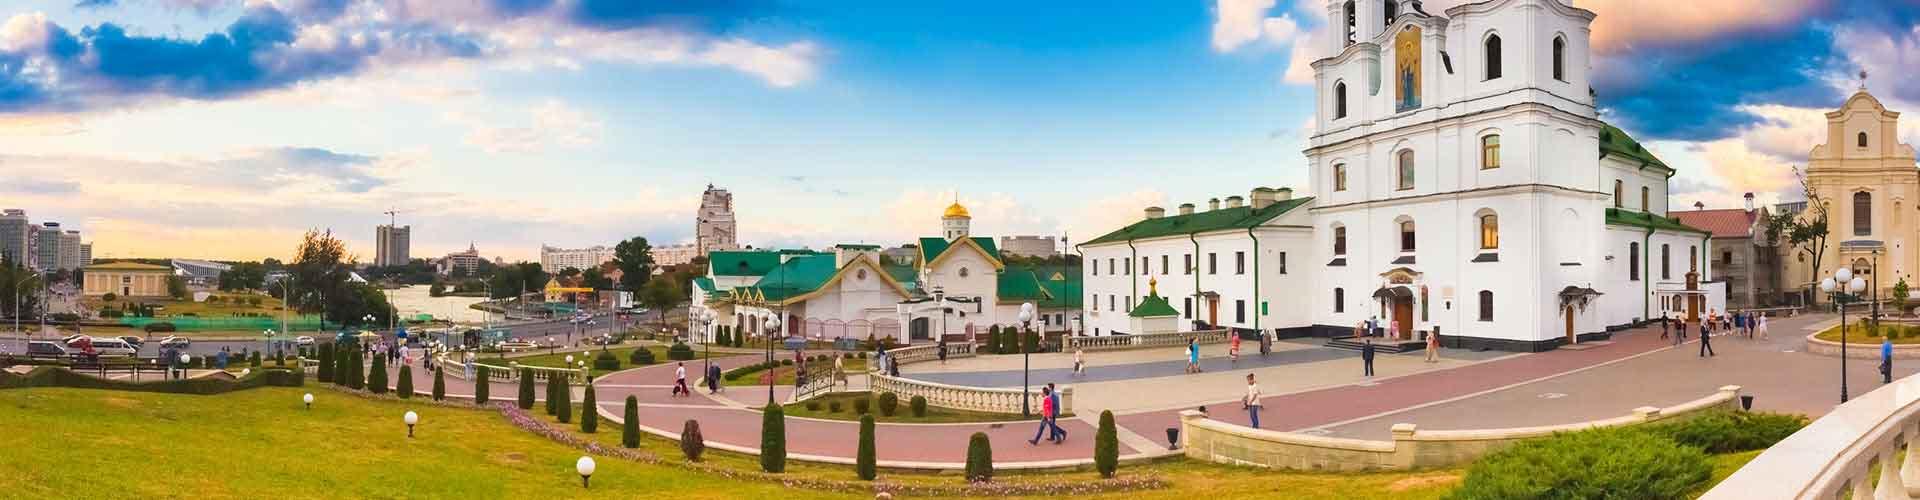 Minsk - Hostales en Minsk. Mapas de Minsk, Fotos y Comentarios para cada hostal en Minsk.